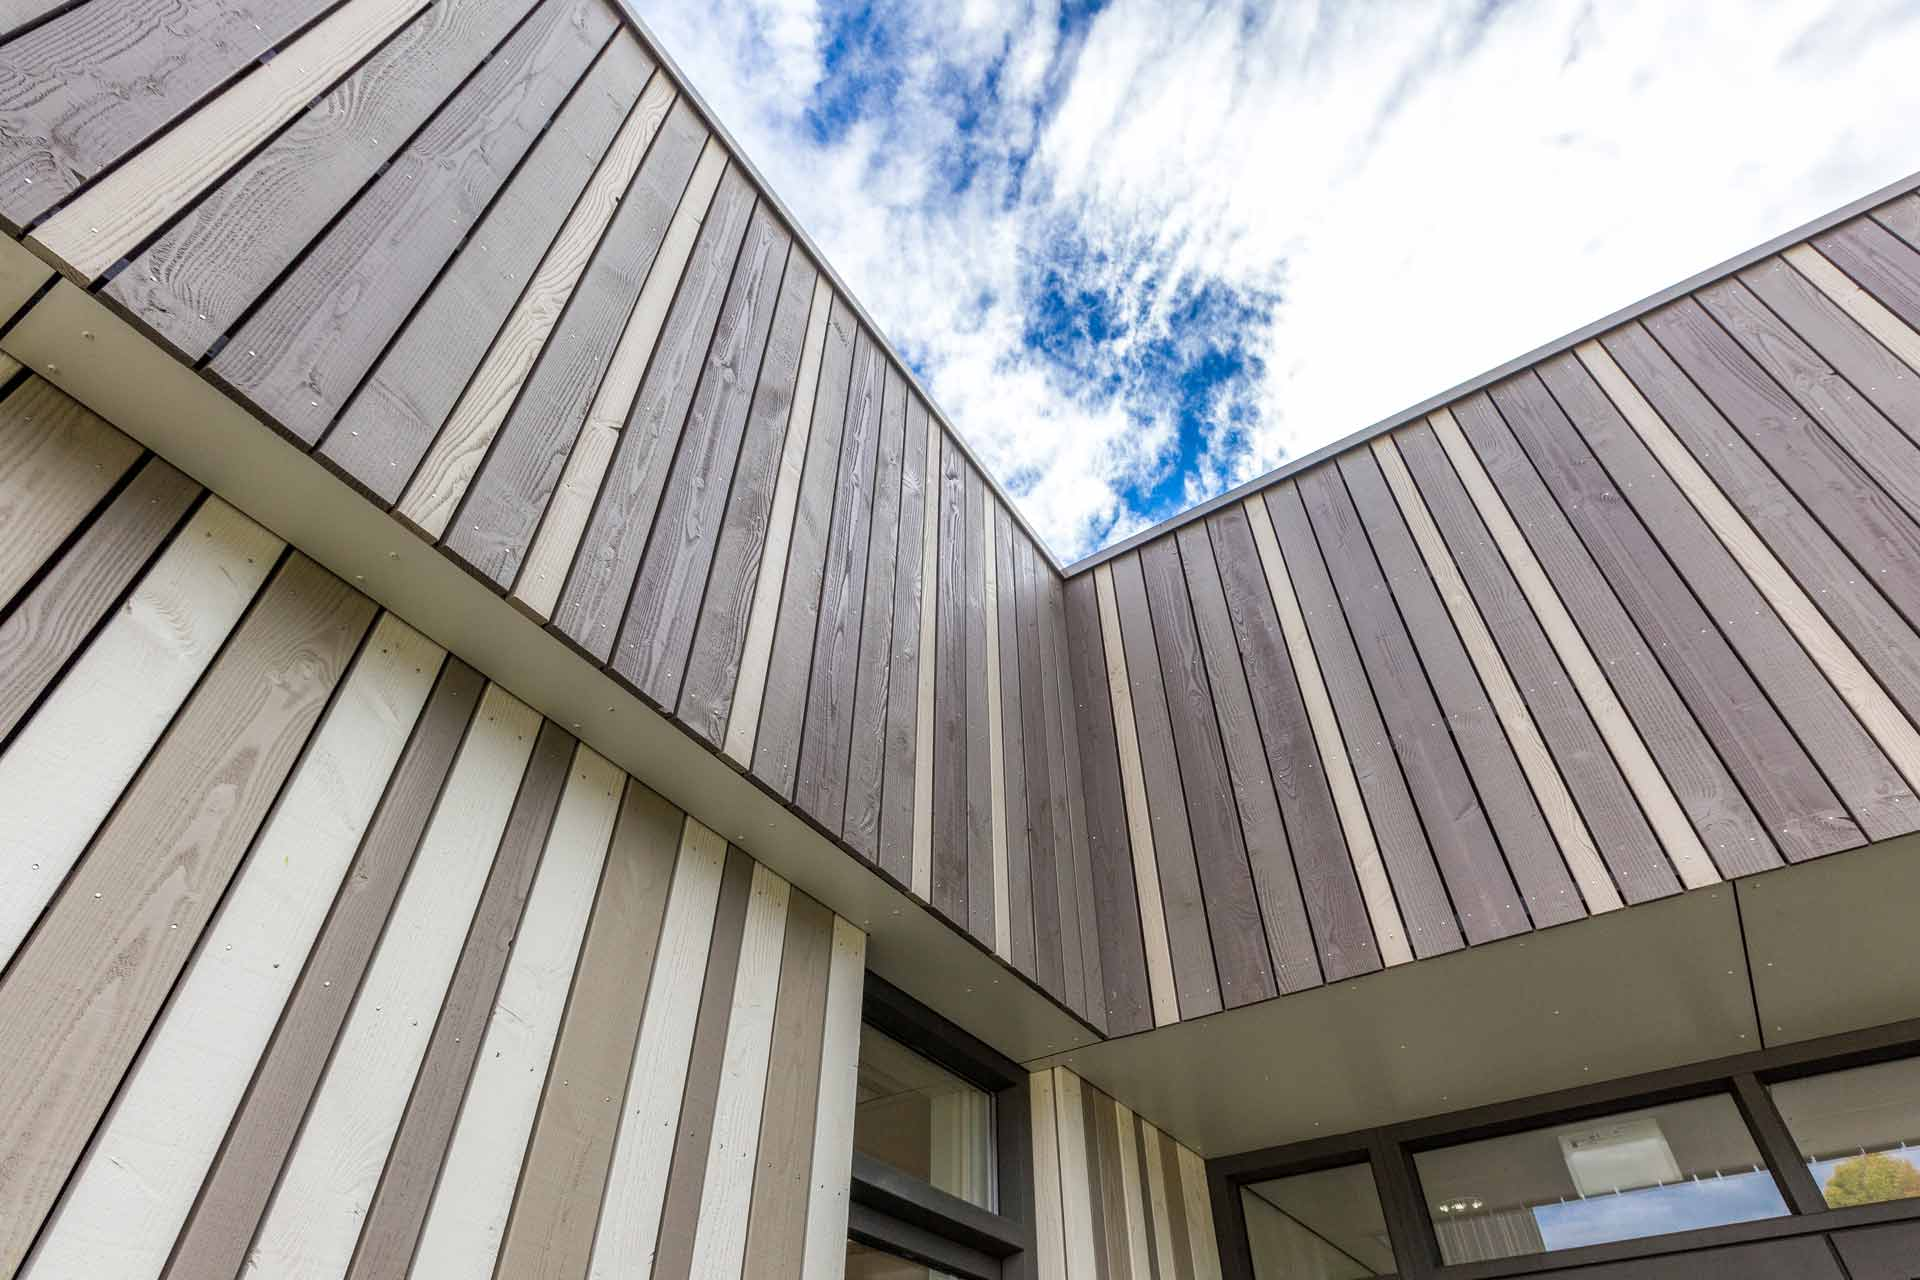 Zonneboom, Roosendaal, SoulWood, houten gevelbekleding, BVR, schoolgebouw